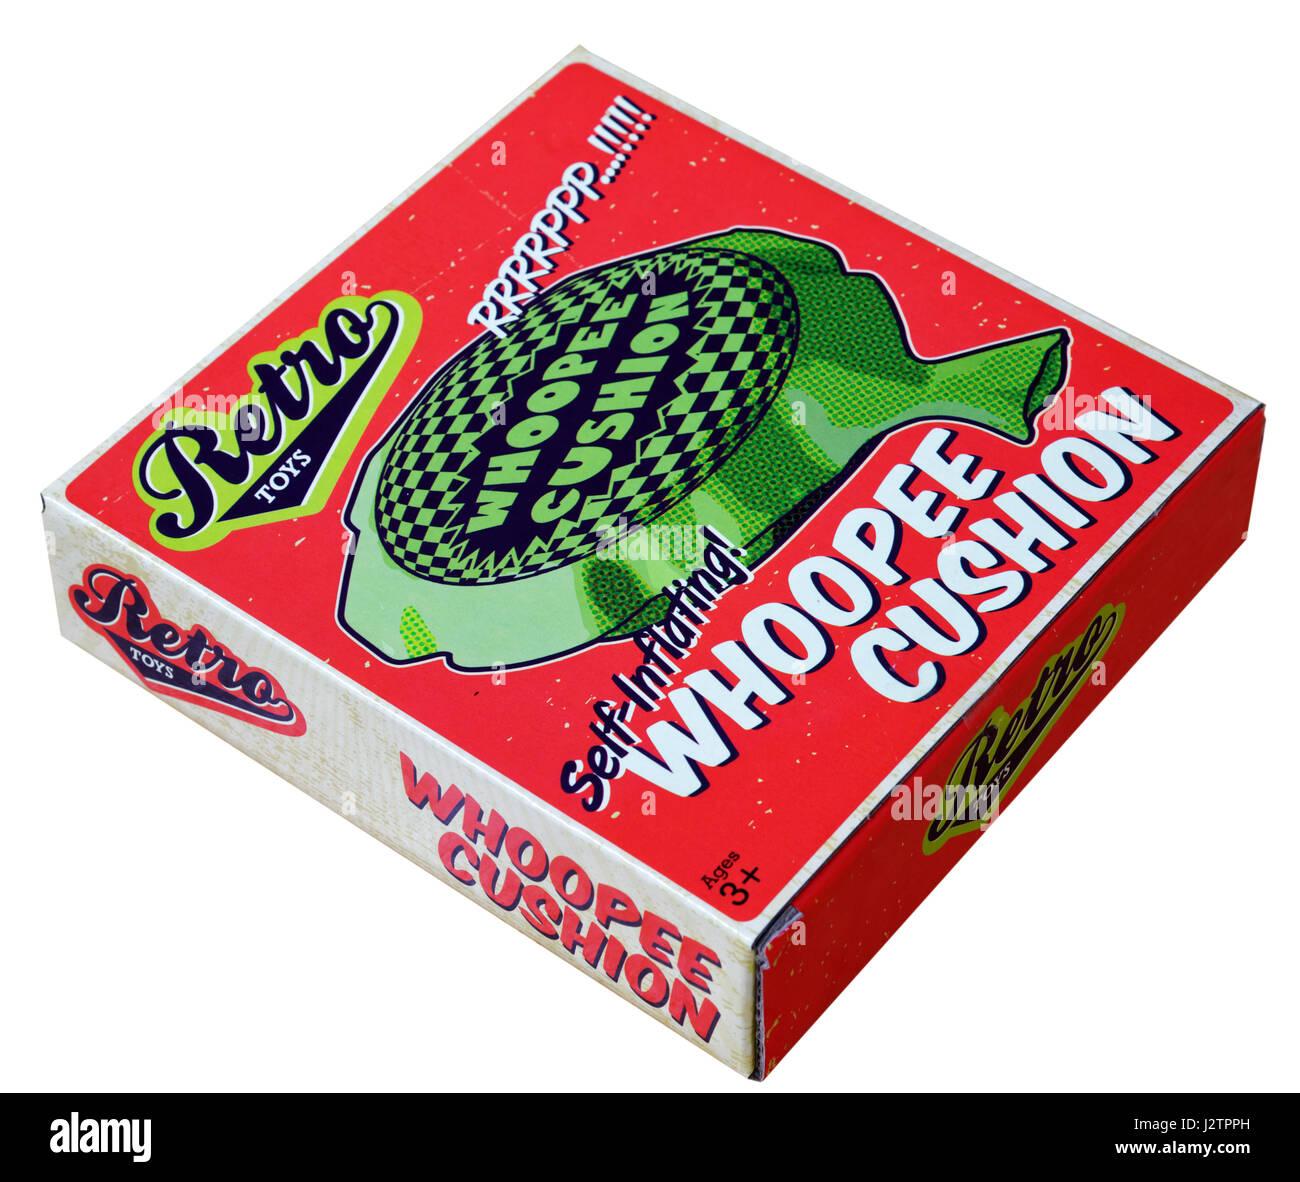 Whoopee Cushion - Stock Image